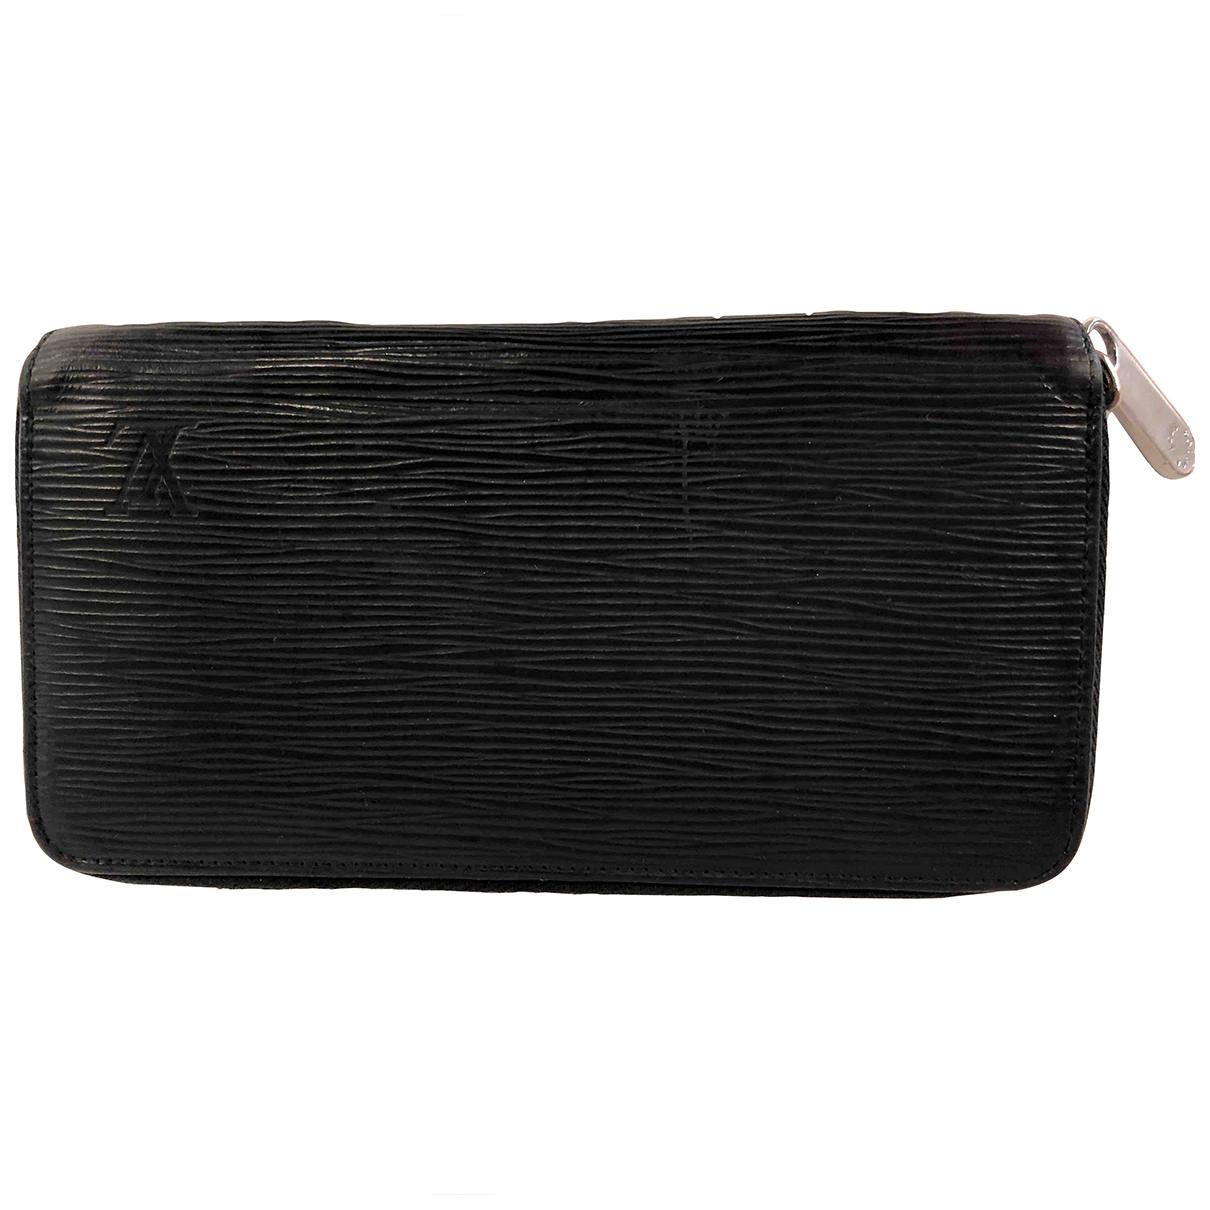 Louis Vuitton Zippy Black Leather wallet for Women N